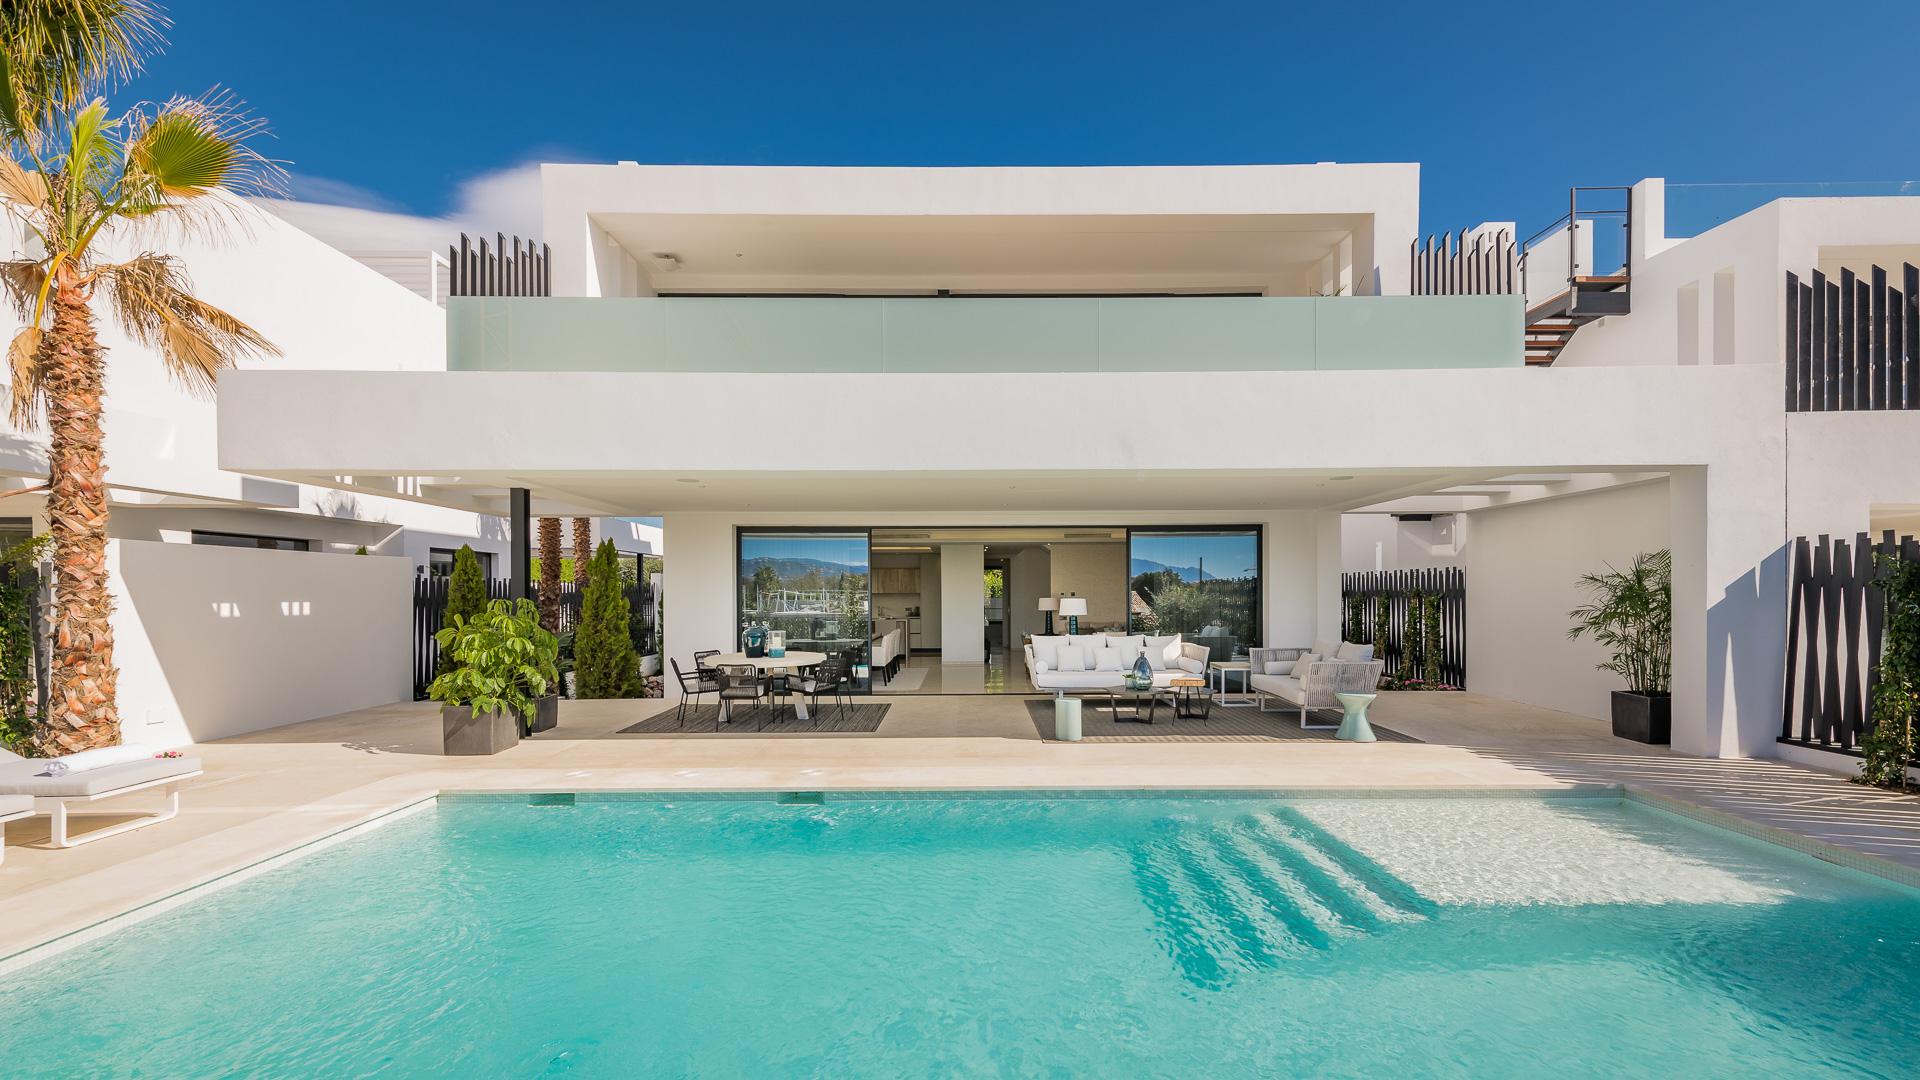 LUX0204: Villa in Marbella